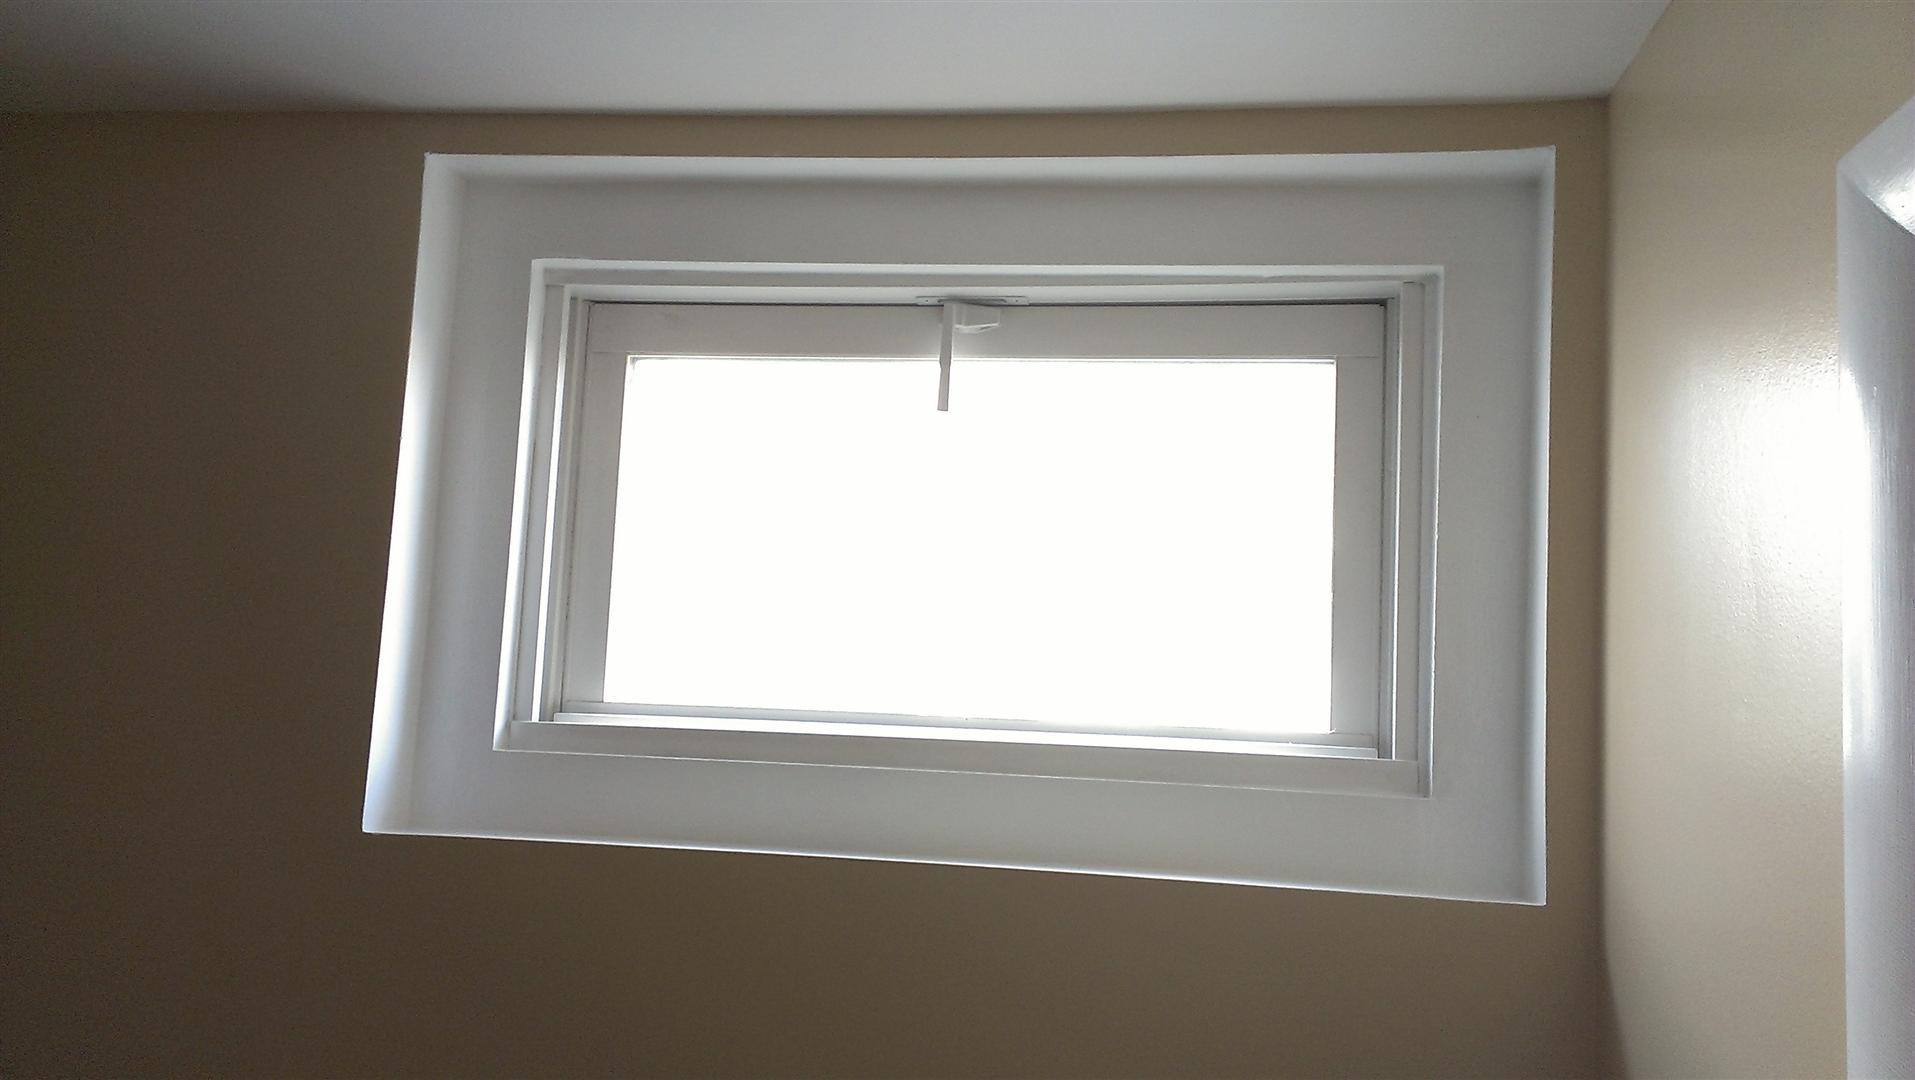 Affordable hasbrouck heights nj basement renovation for Contractors window design